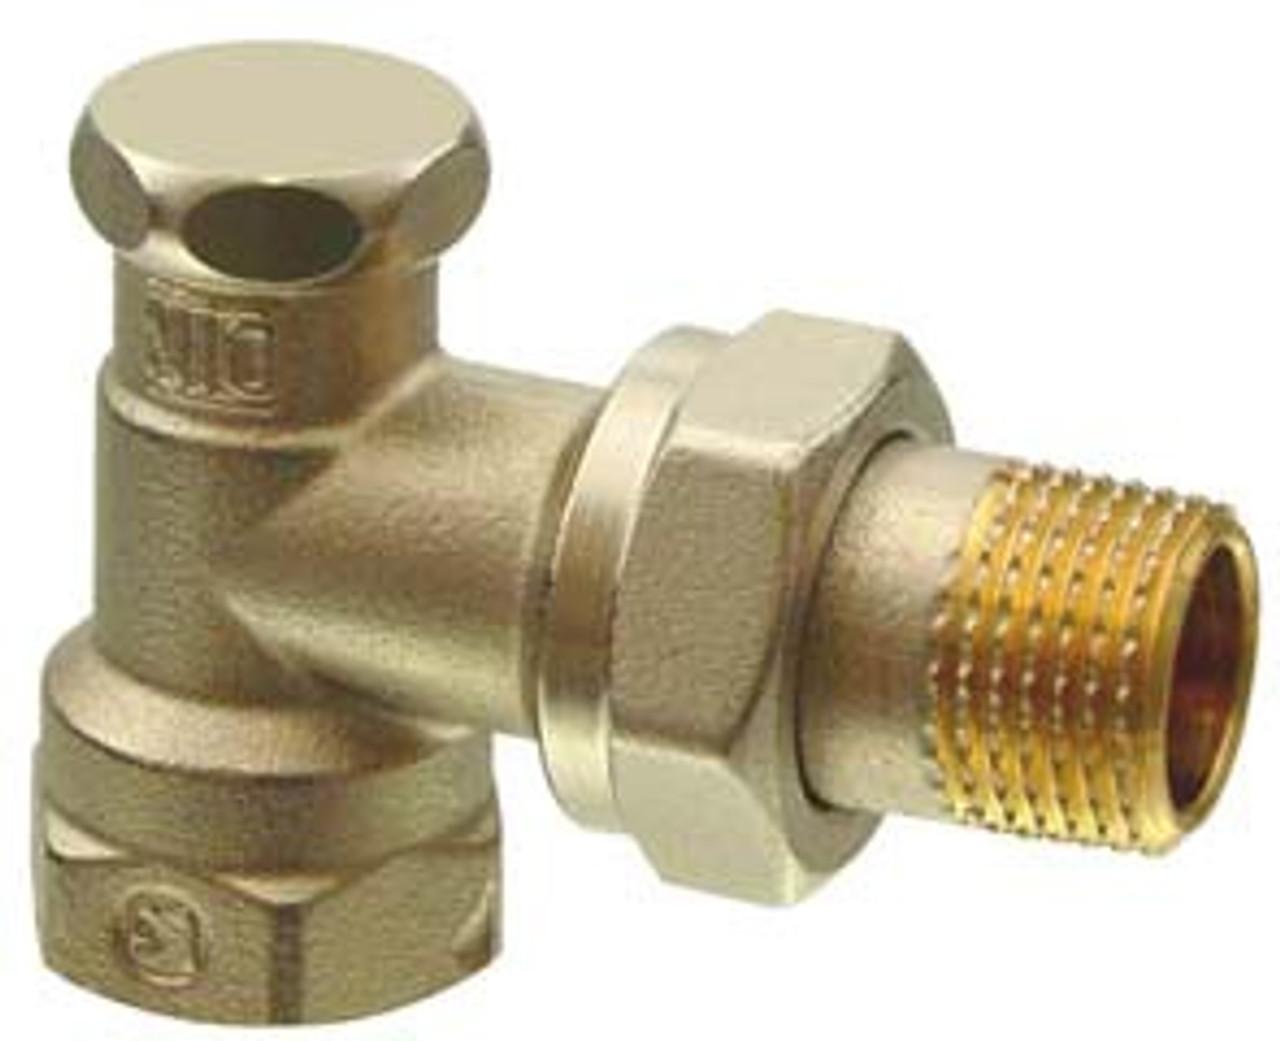 Siemens AEN20 Angle lockshield valve